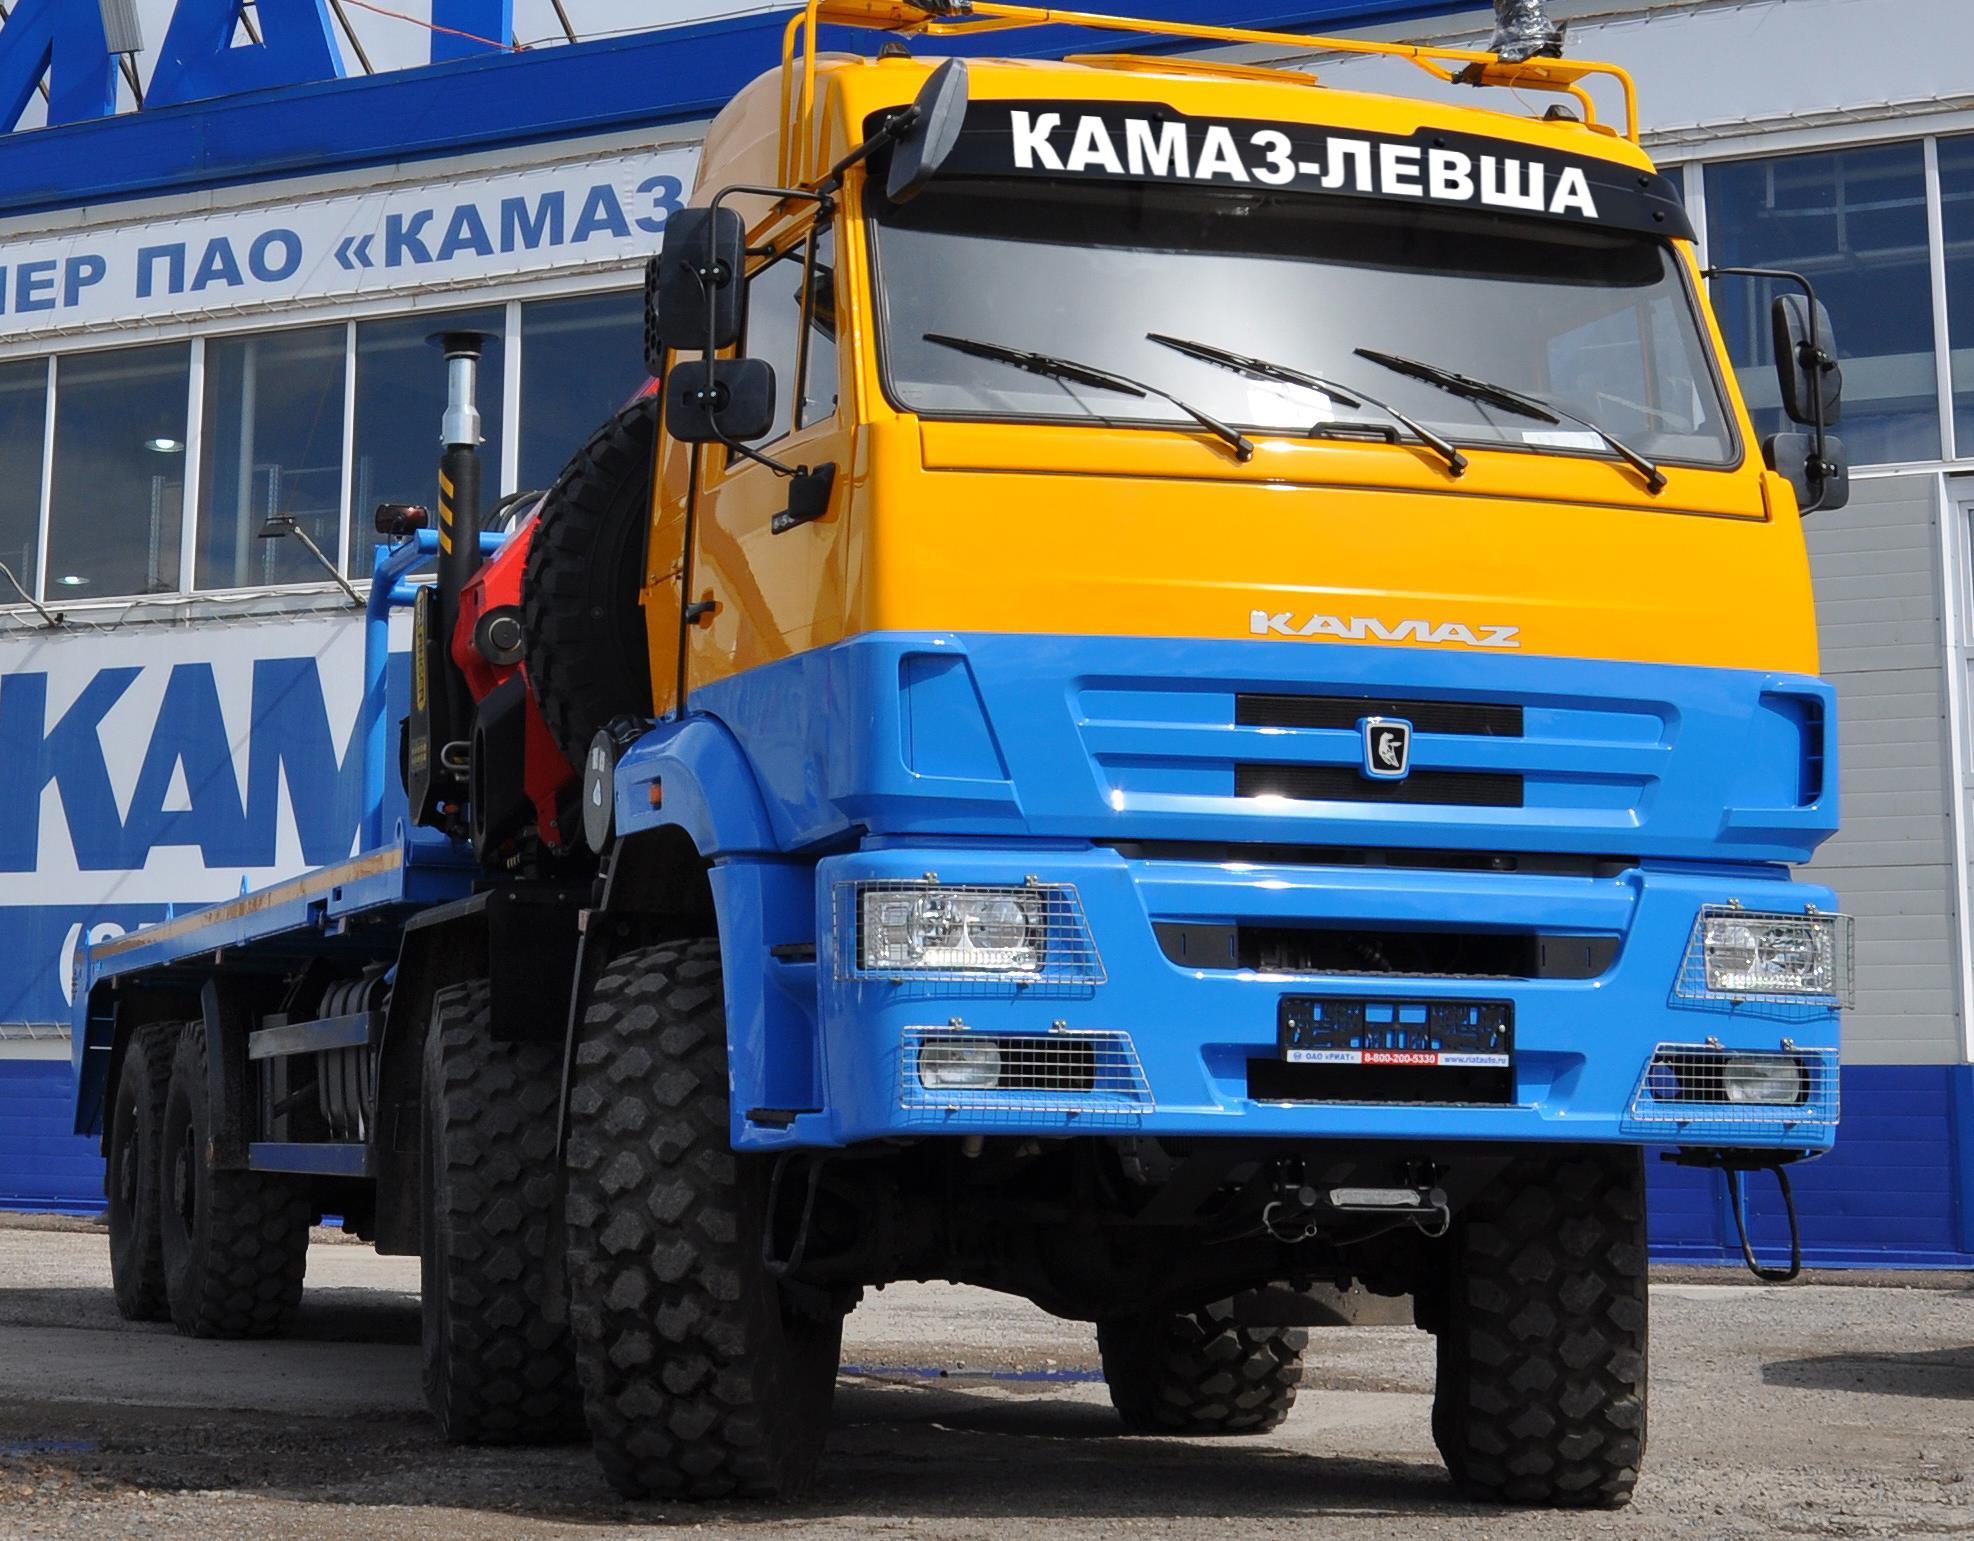 КАМАЗ-ЛЕВША для Крайнего Севера